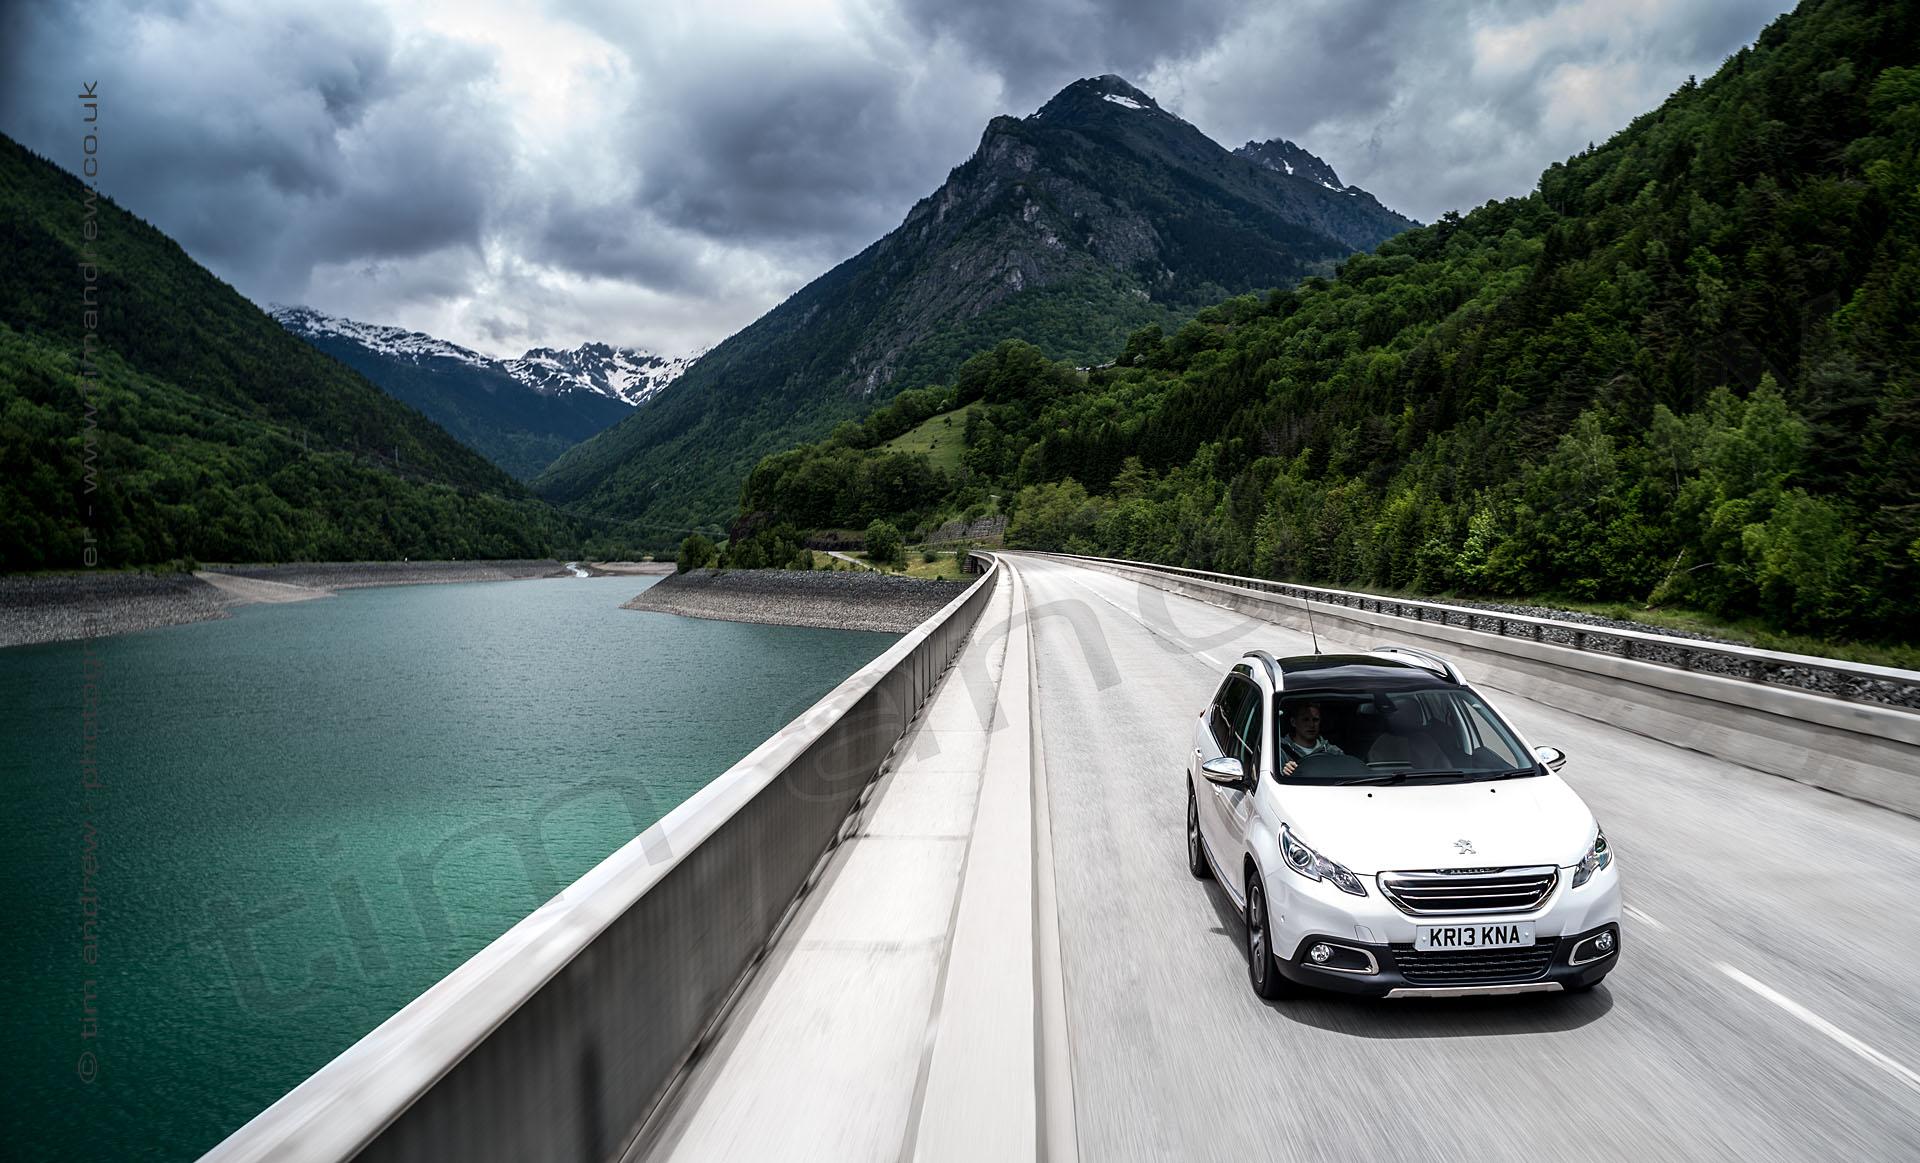 Peugeot in Alps